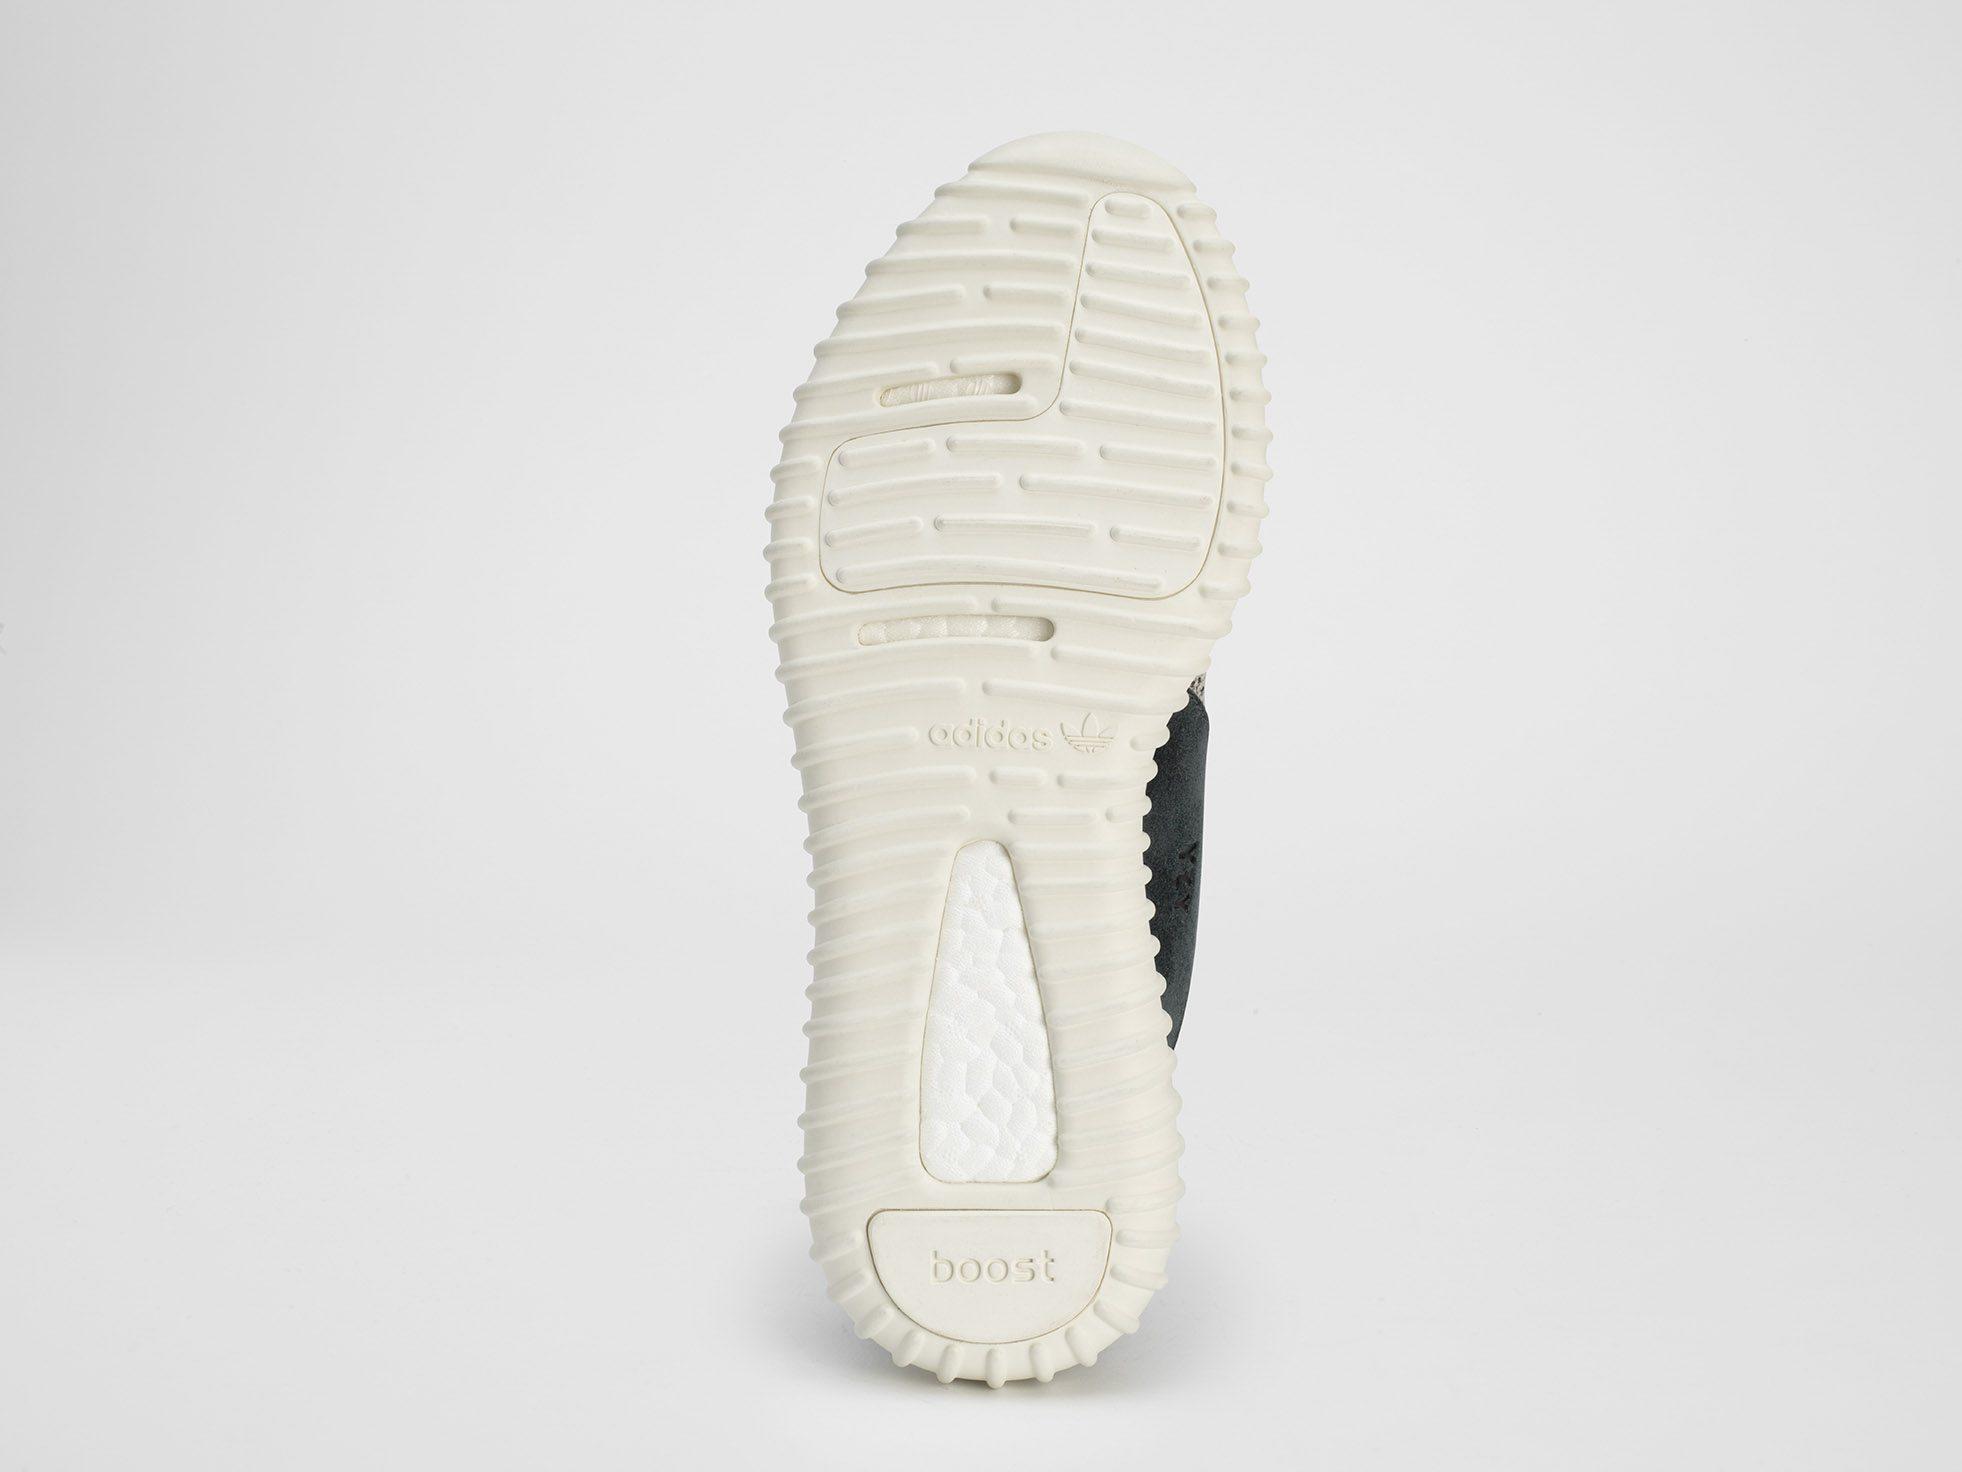 Kanye West x adidas Originals Yeezy Boost 350 5